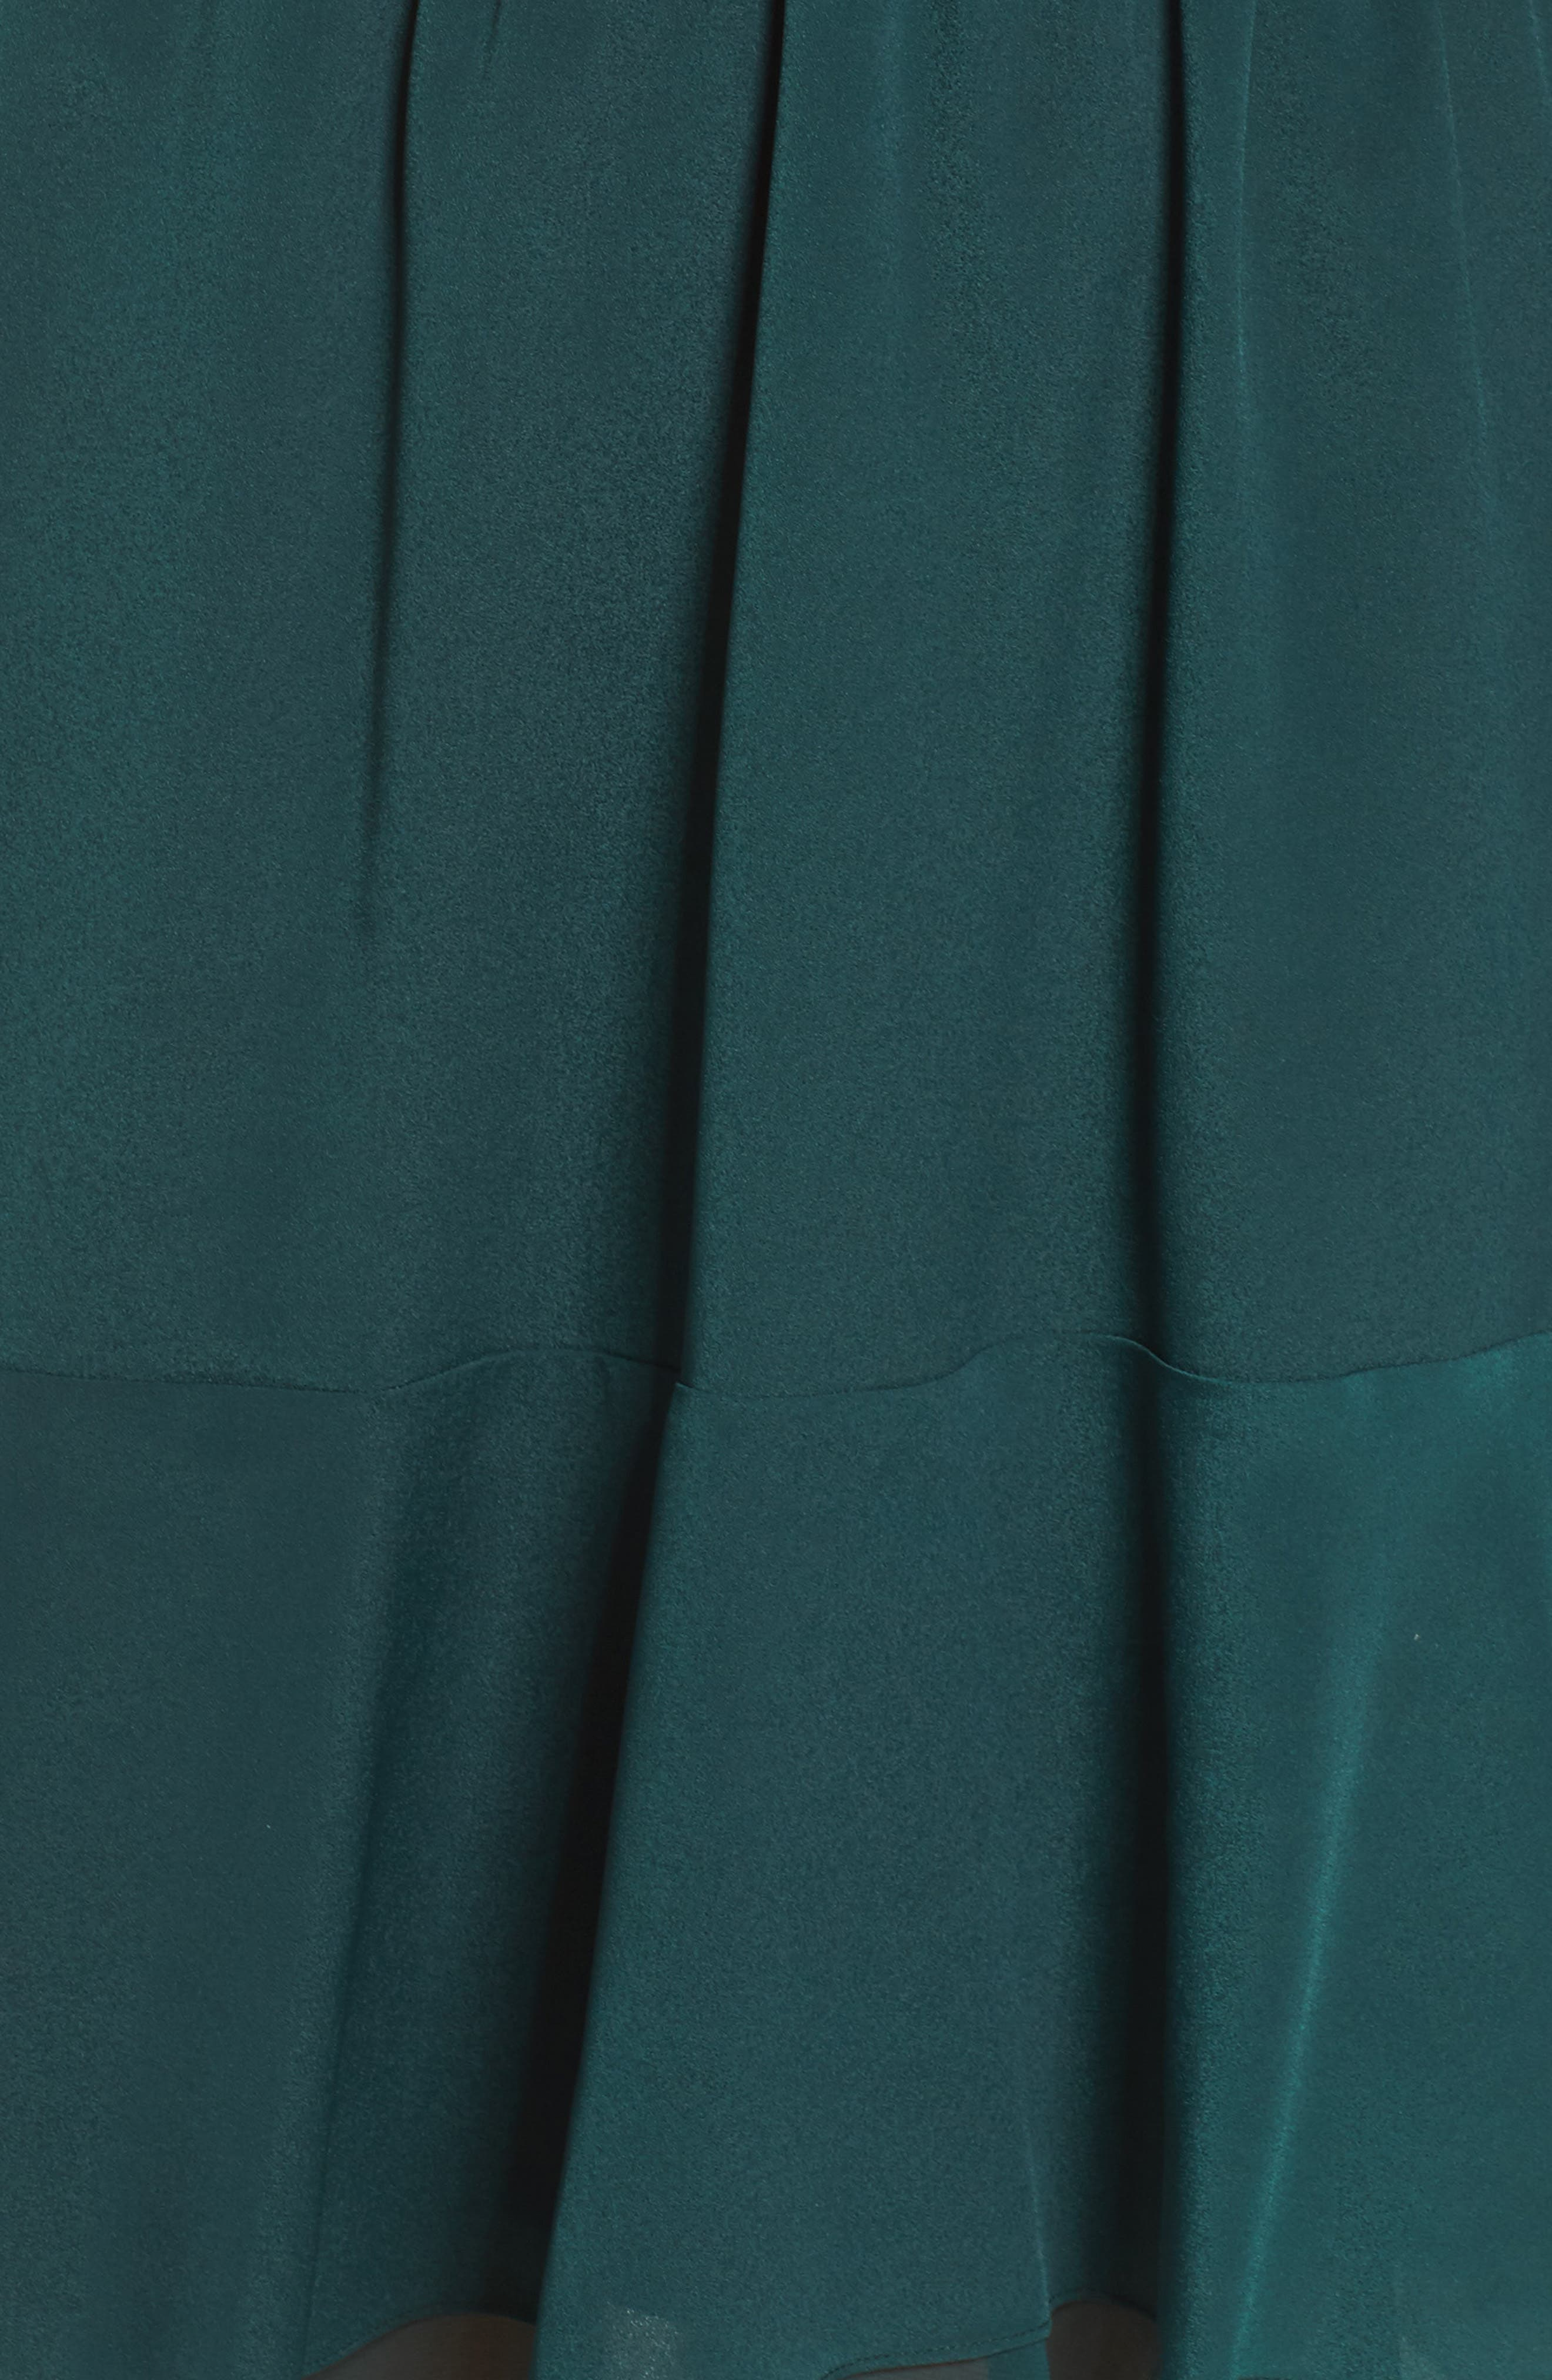 Keely Ruffle Blouson Dress,                             Alternate thumbnail 5, color,                             309